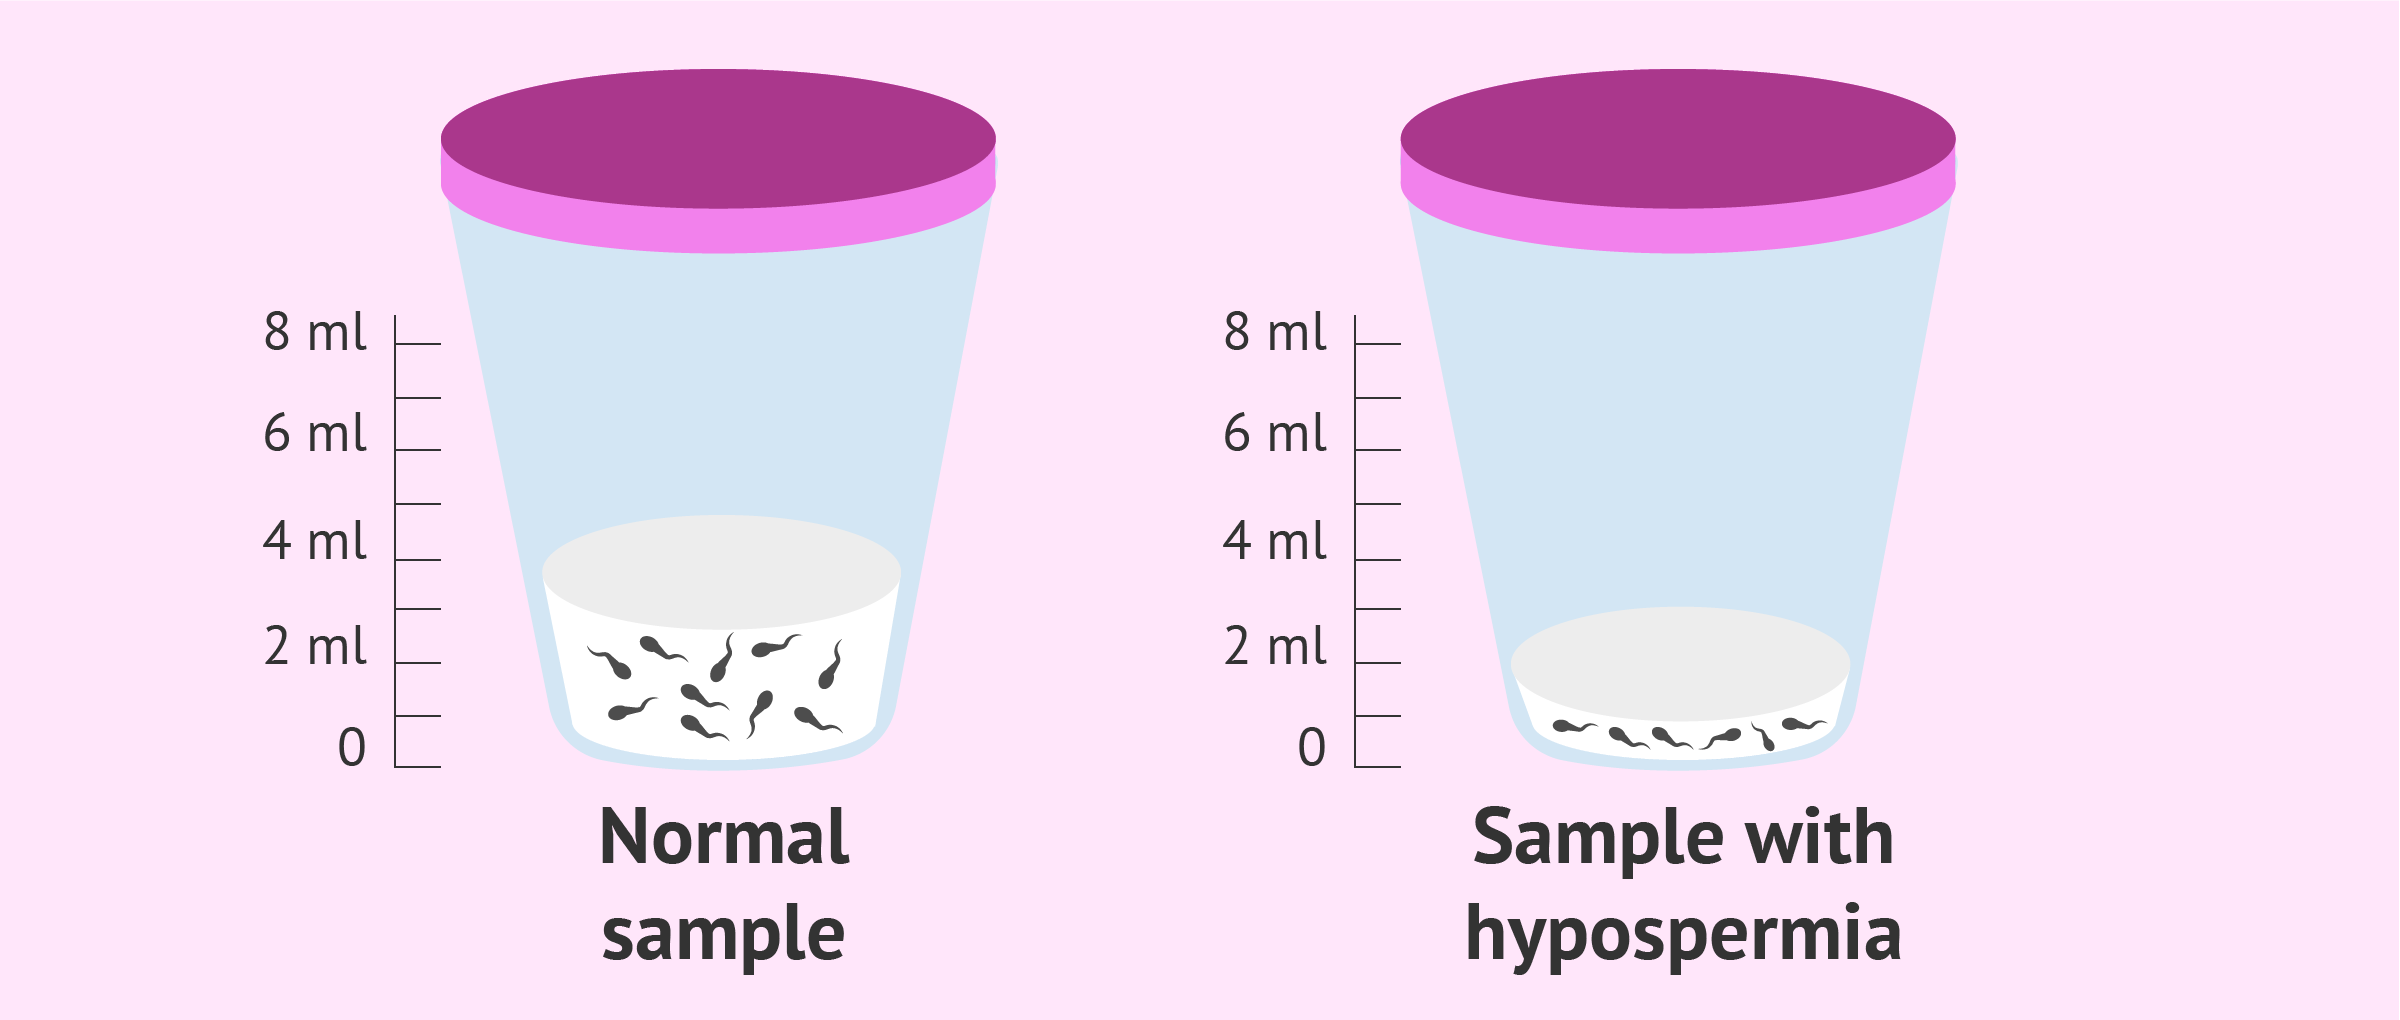 Seminal sample with hypospermia